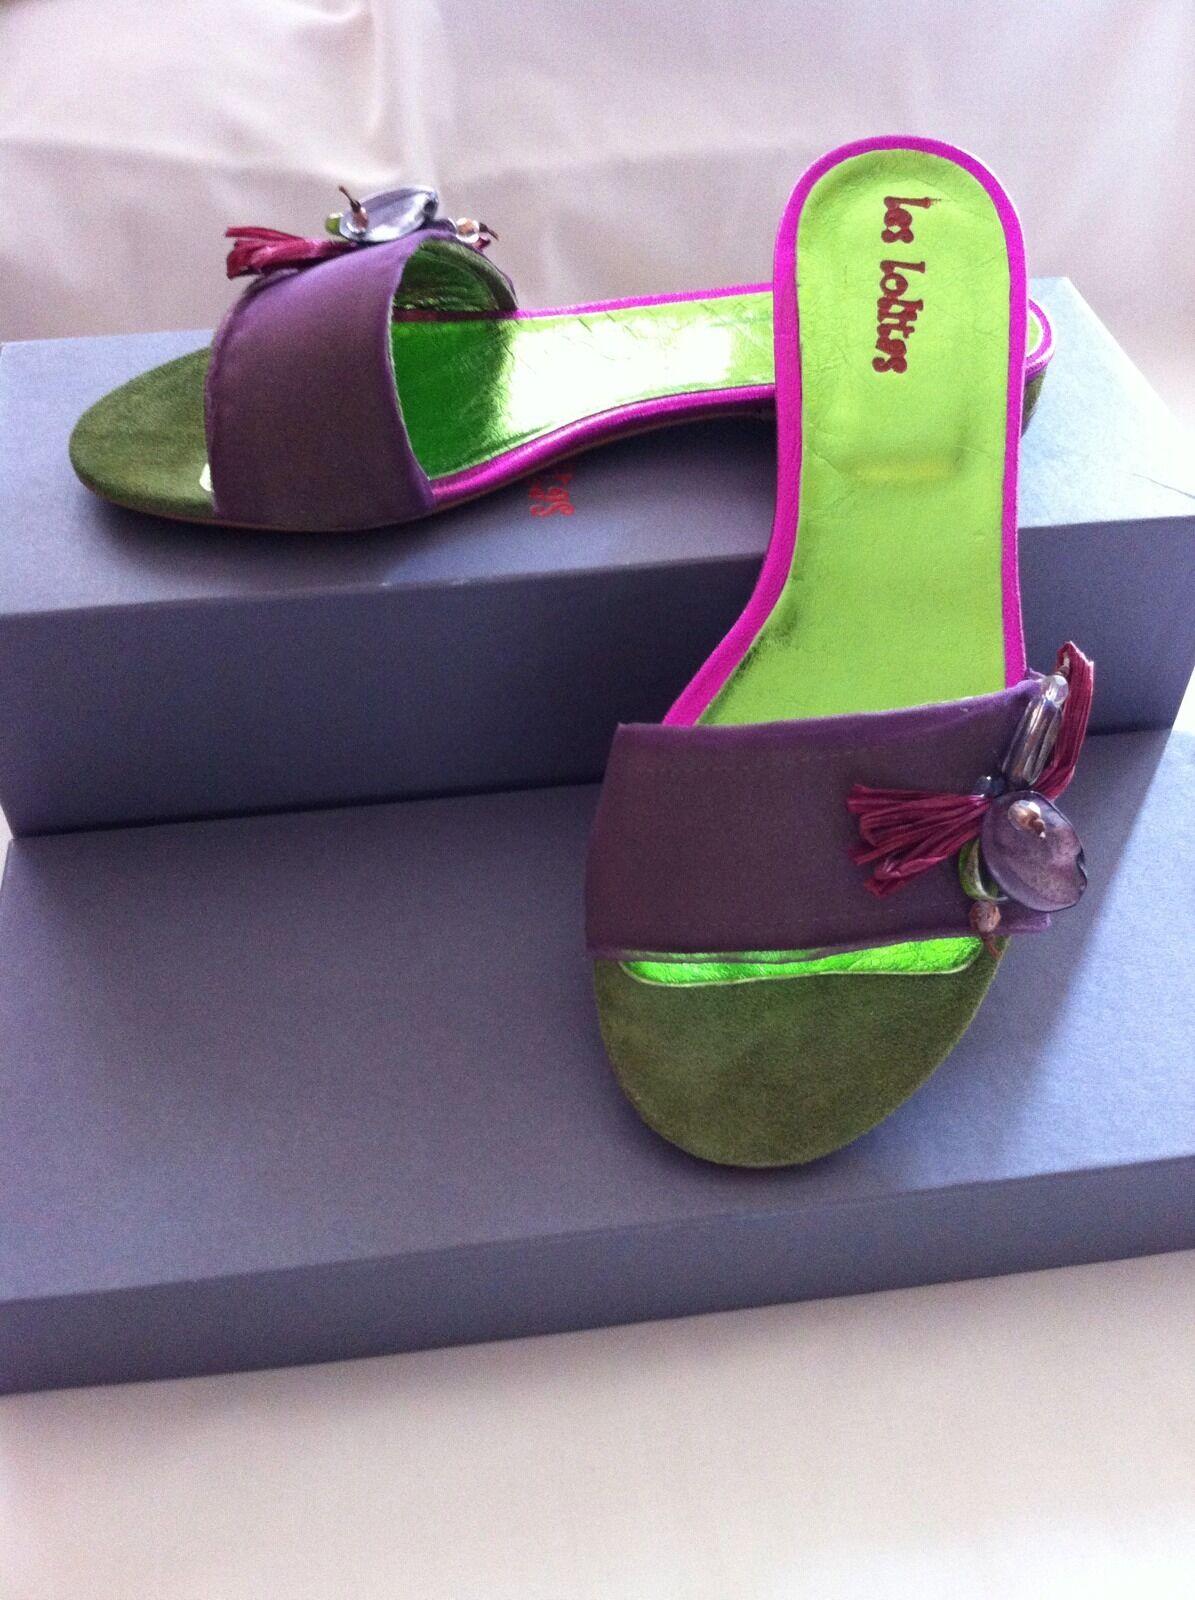 Les Lolitas 100% Leather Sandals - UK 5 - BNWB